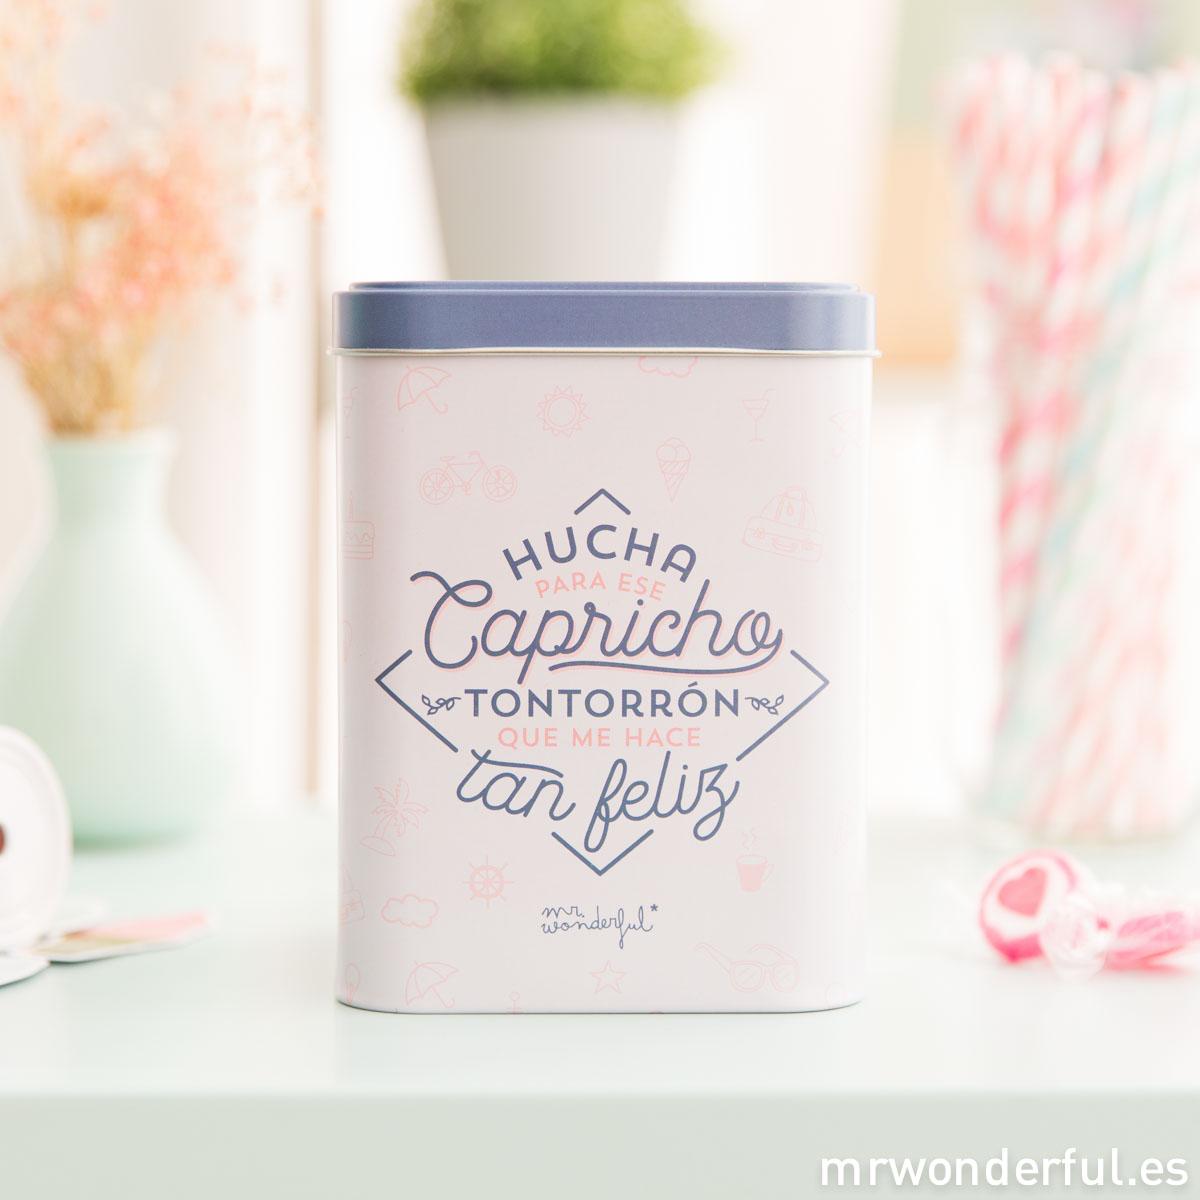 mrwonderful_8435460705004_WOM02966_hucha_capricho-que-me-hace-tan-feliz_CAST-3